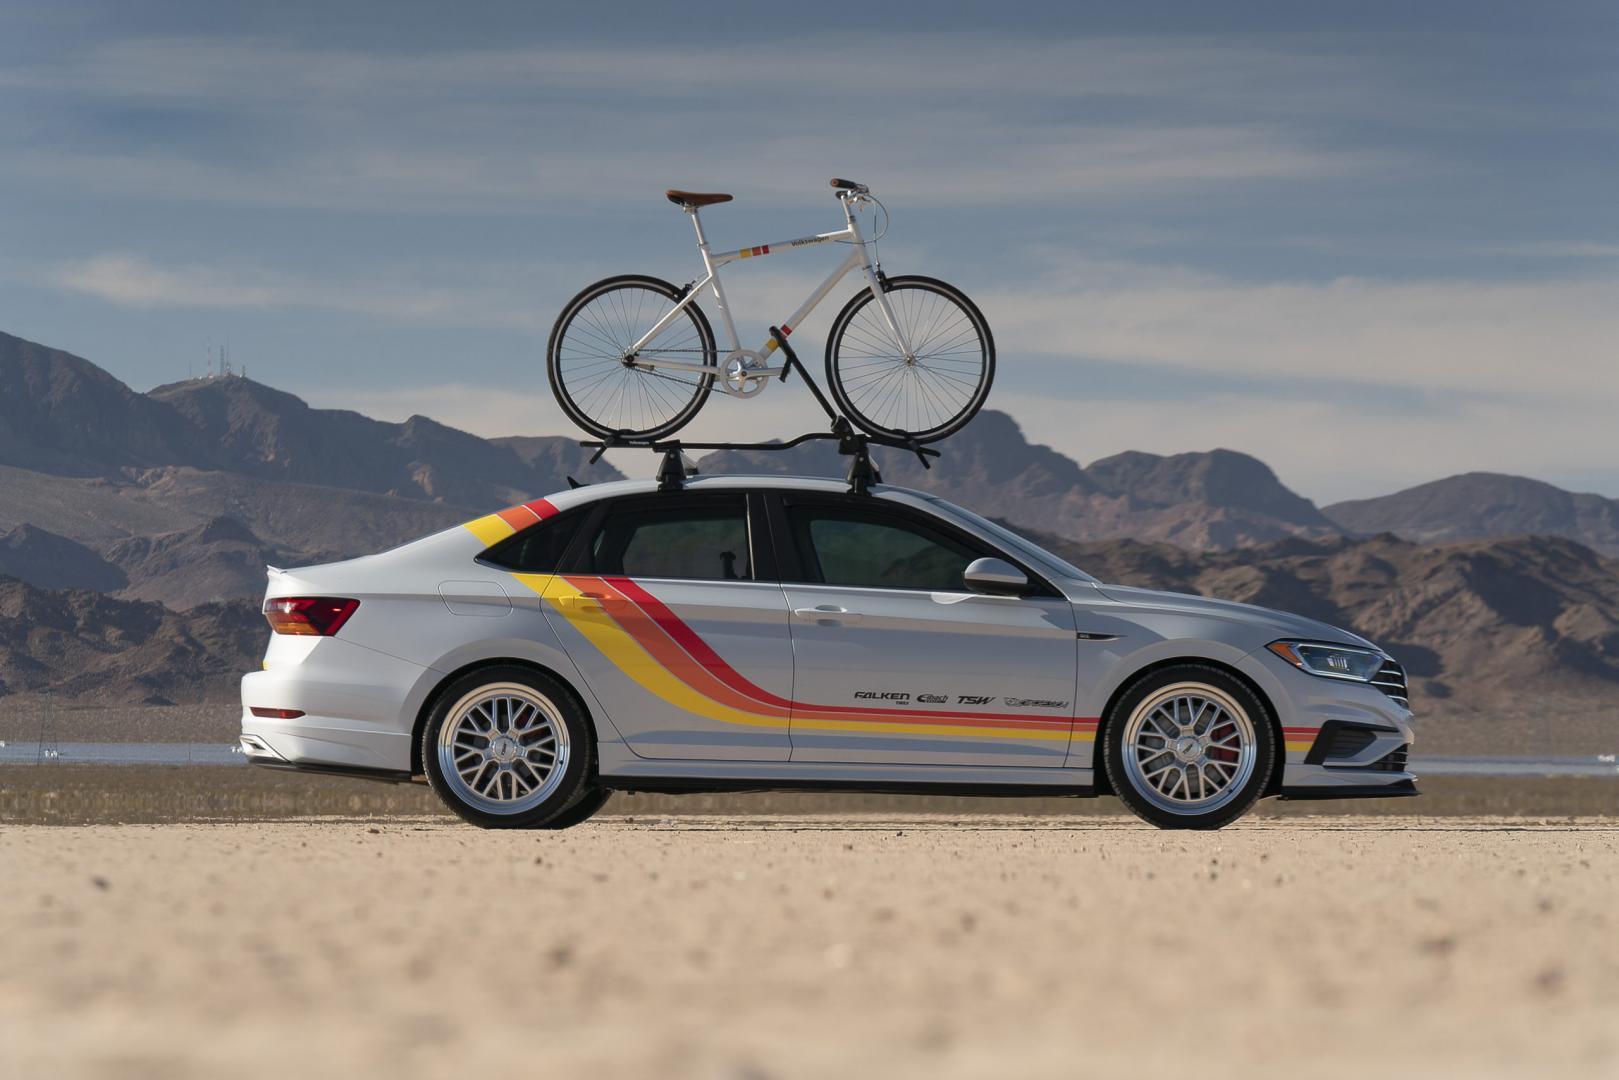 Volkswagen Jetta air design fiets retro fiets fietsendrager